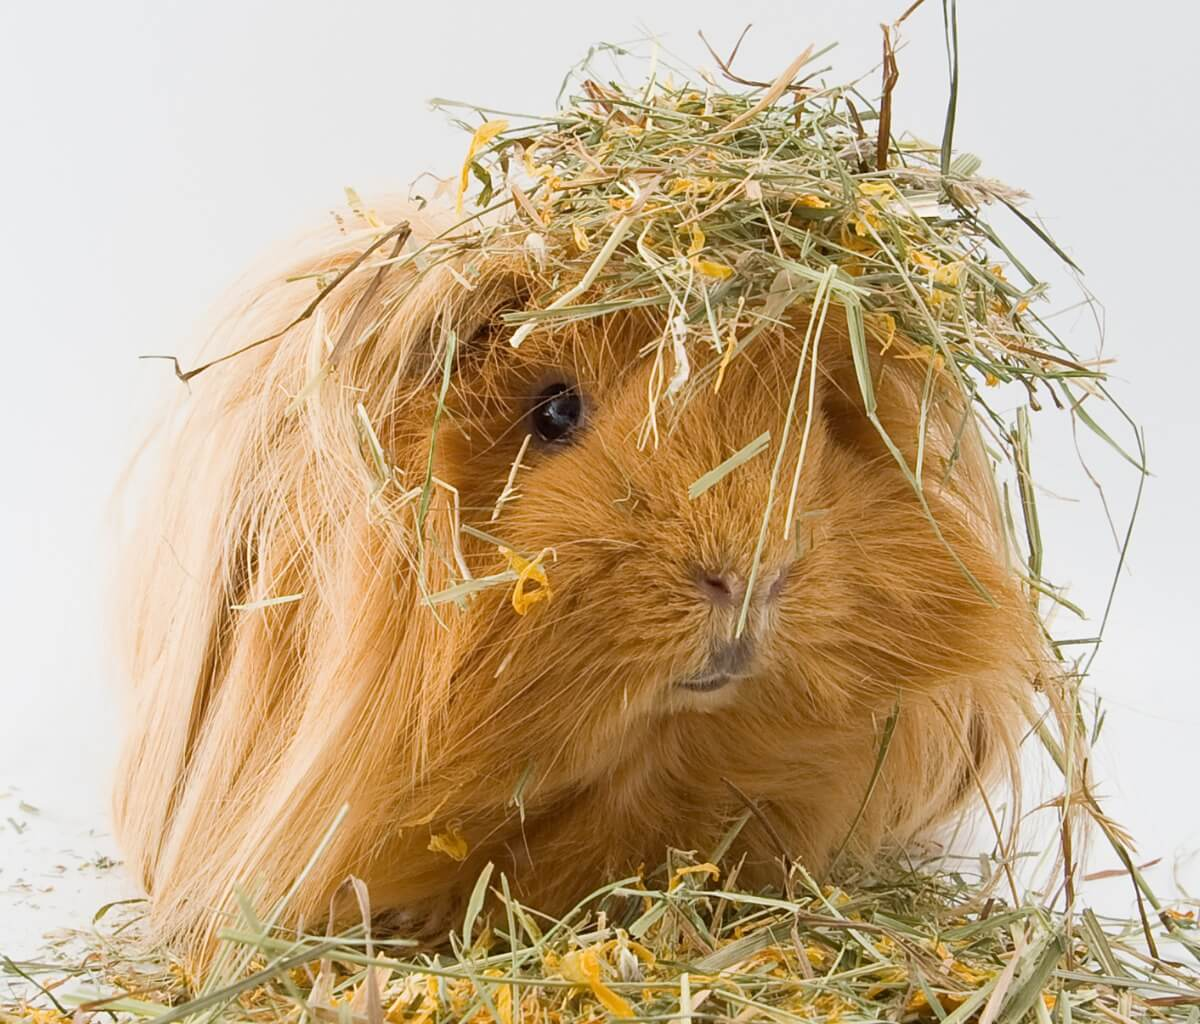 A sheltie guinea pig on hay.